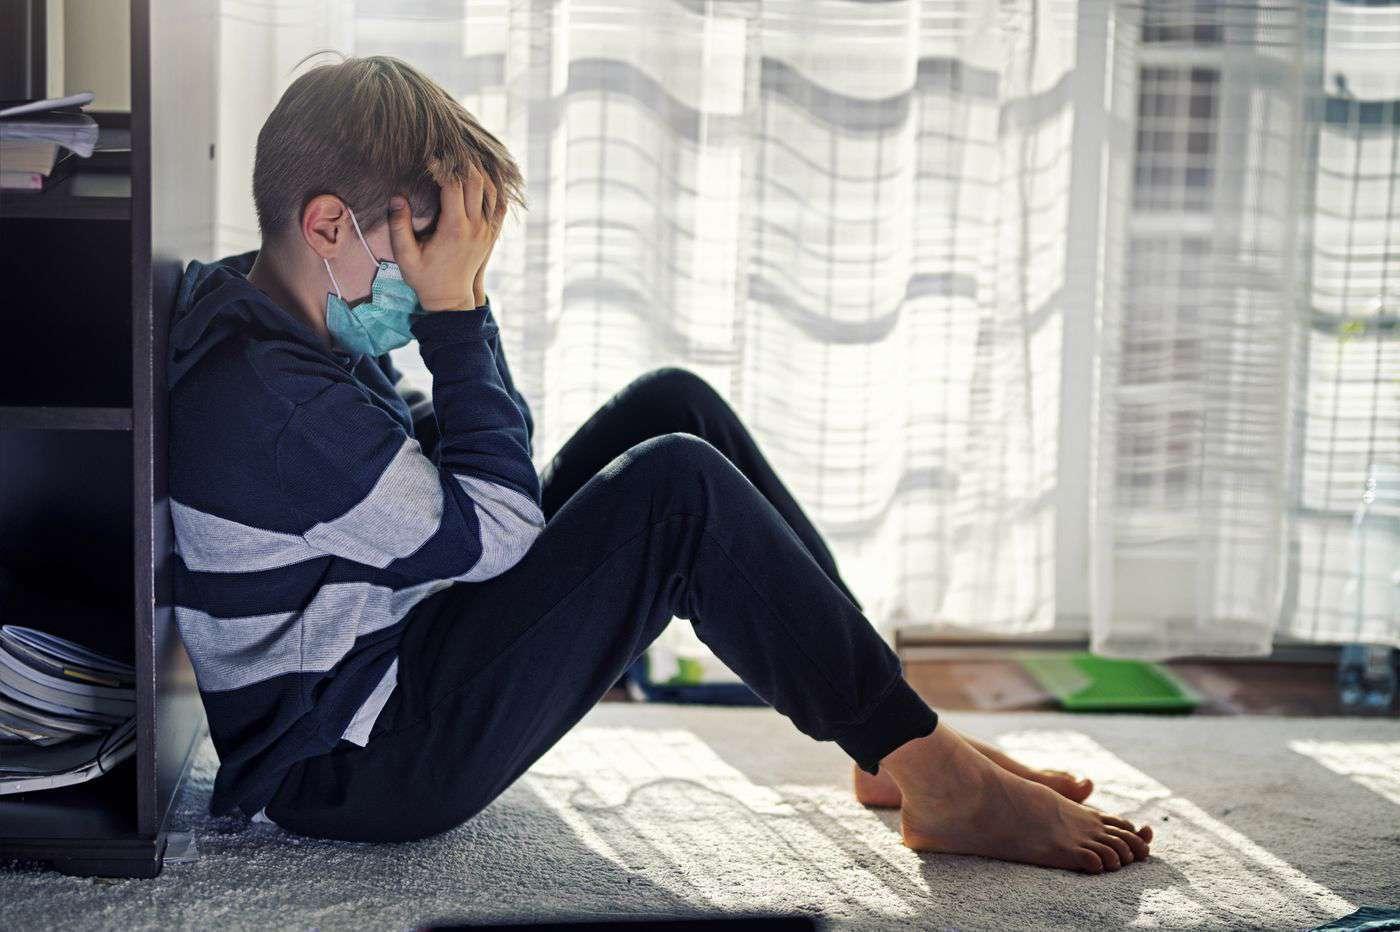 کودک مضطرب در قرنطینه